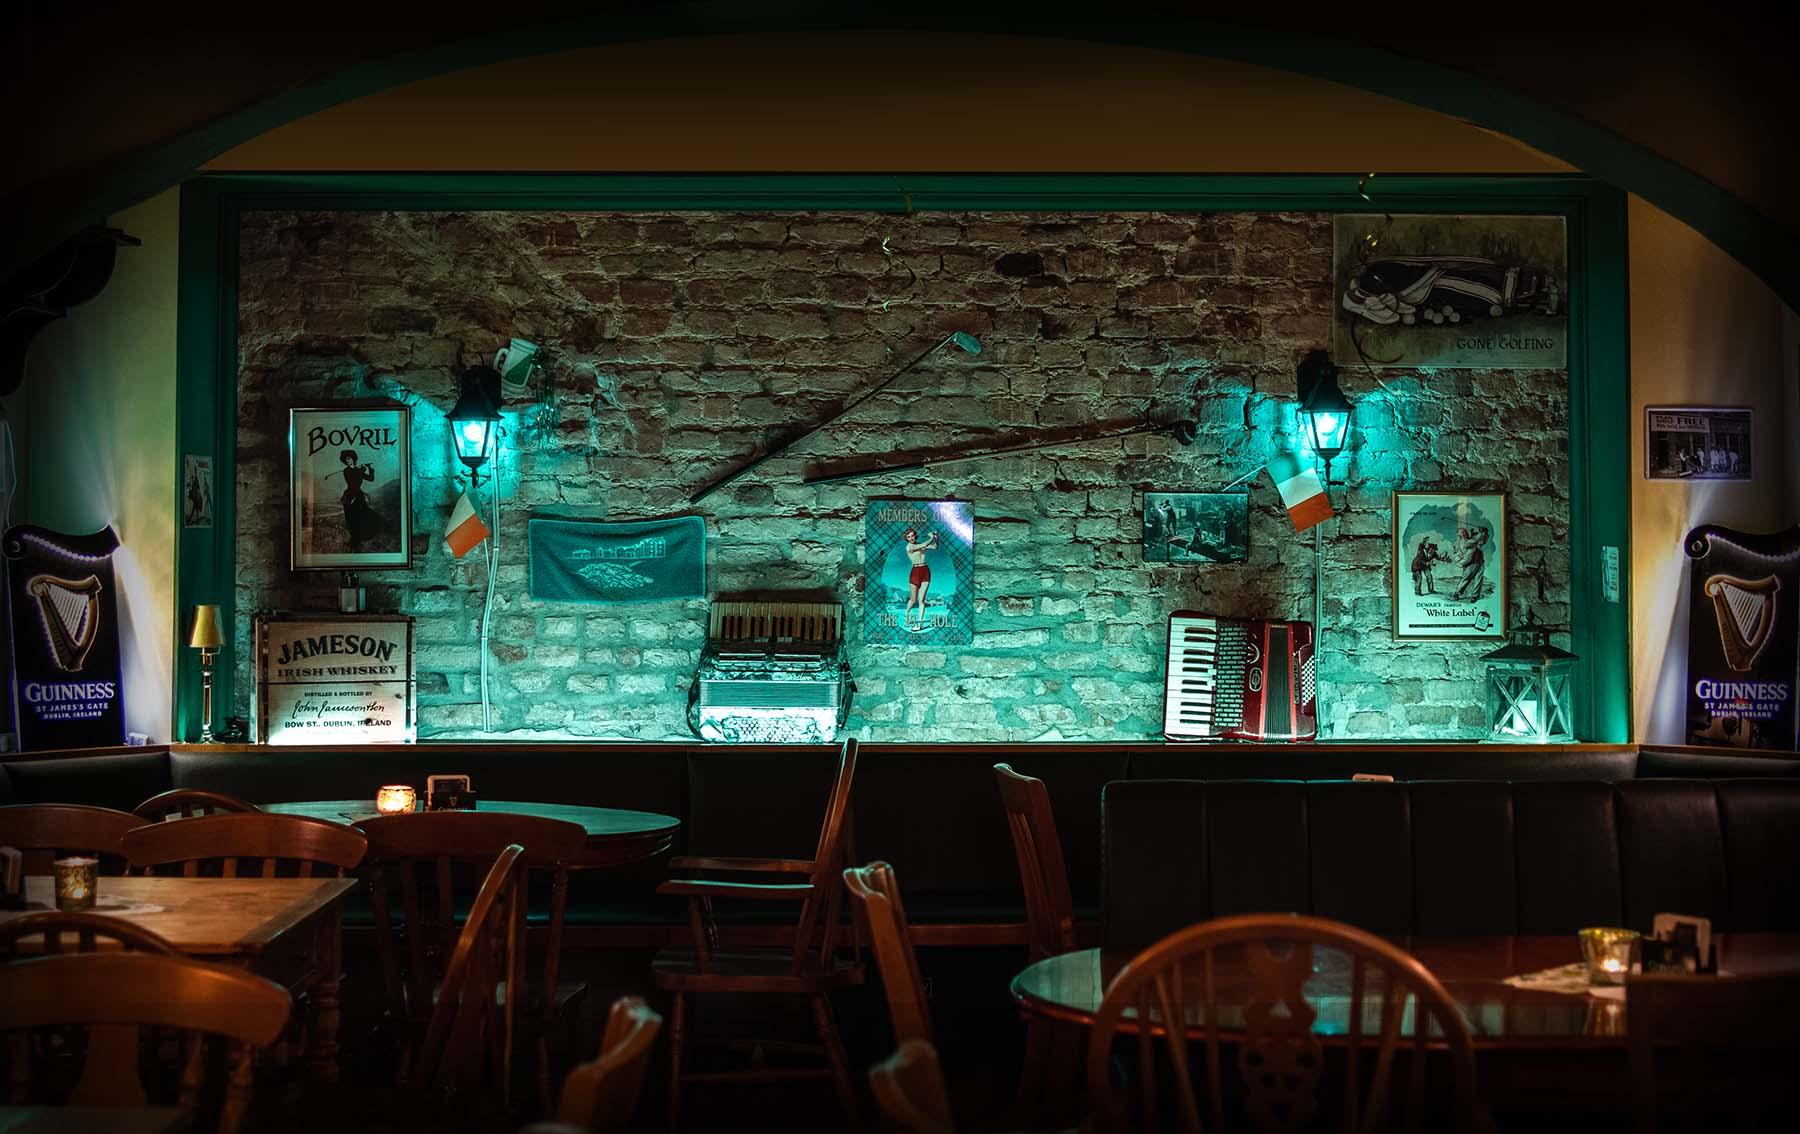 Shamrocks-Irish-Pub-Potsdam-mobile